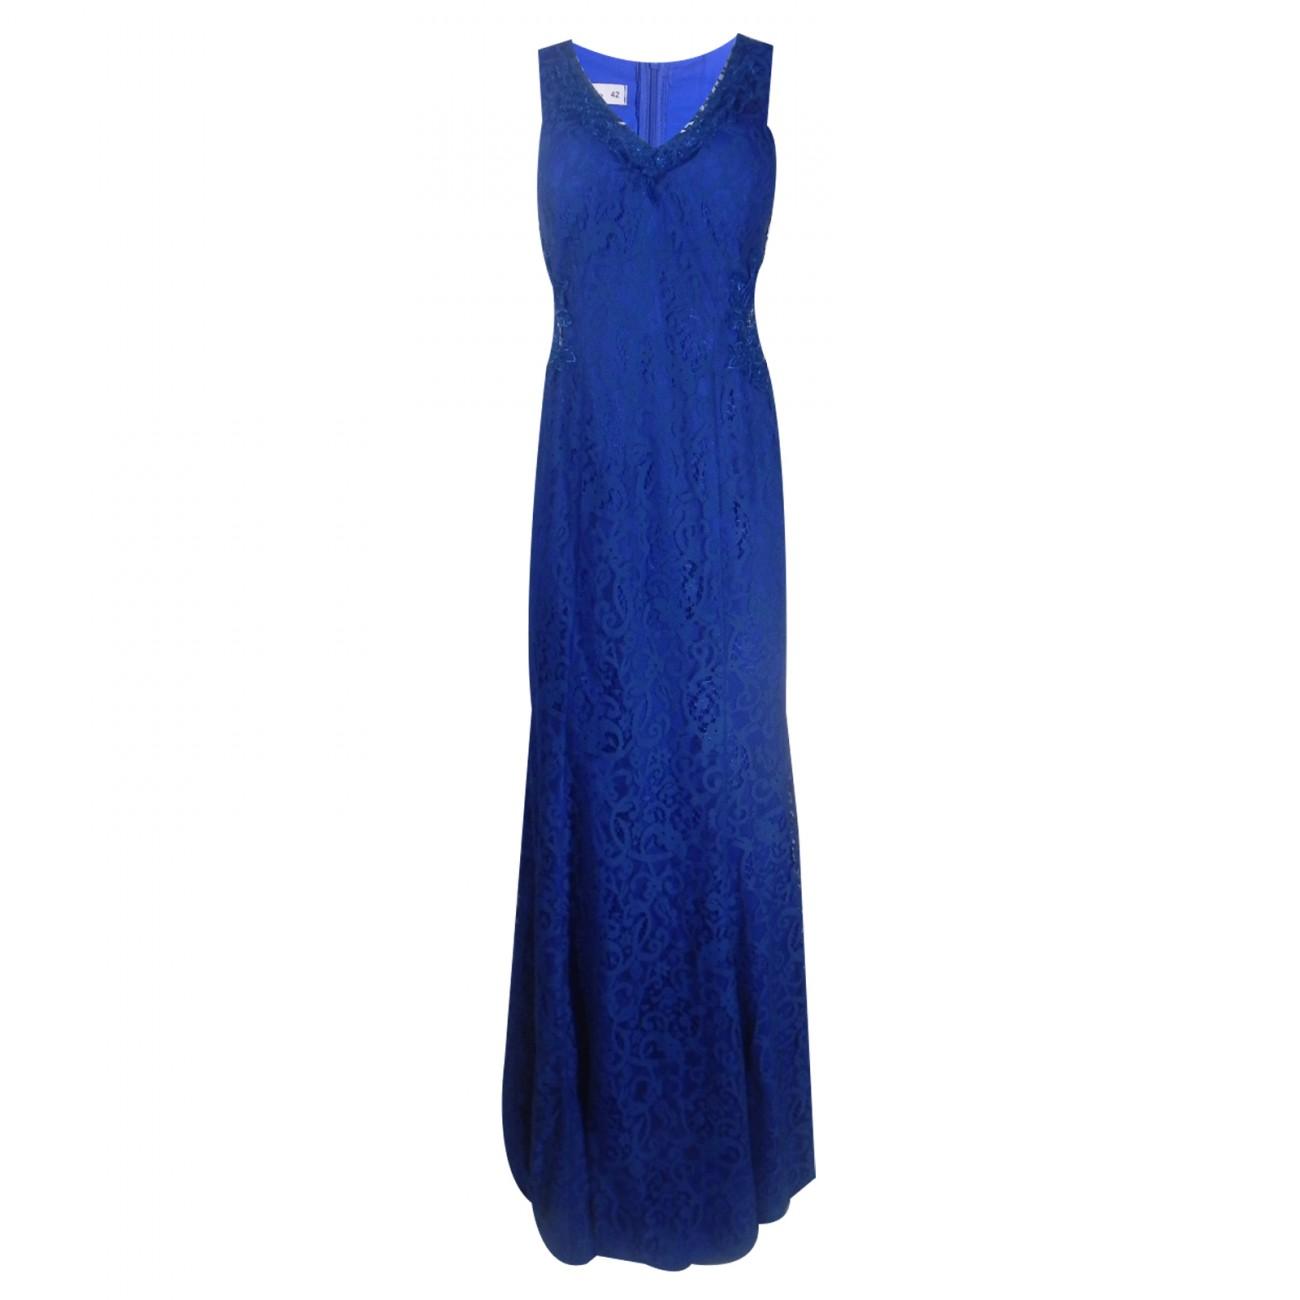 deaea90d35 Vestido Longo de Renda Azul Bic Detalhe Tule Ilusion- Adoro - Pole Modas